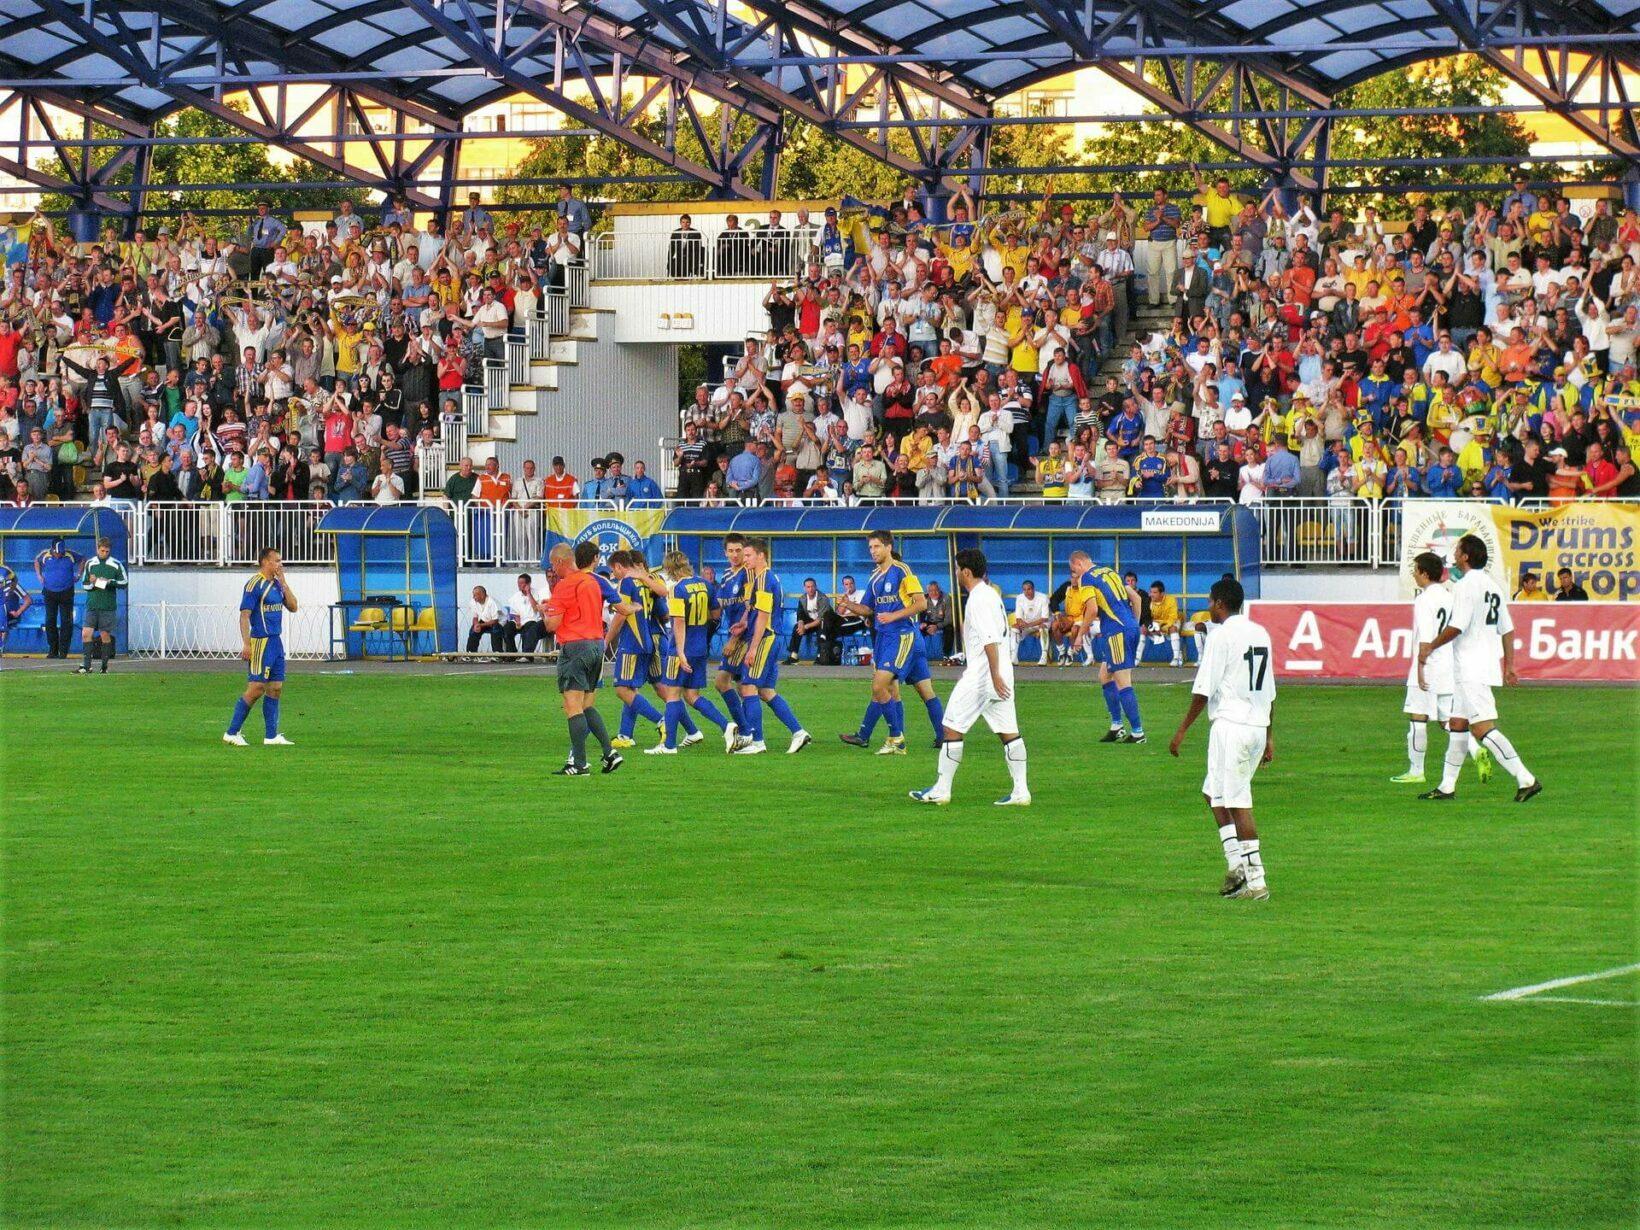 Футболисты клуба БАТЭ Борисов на стадионе